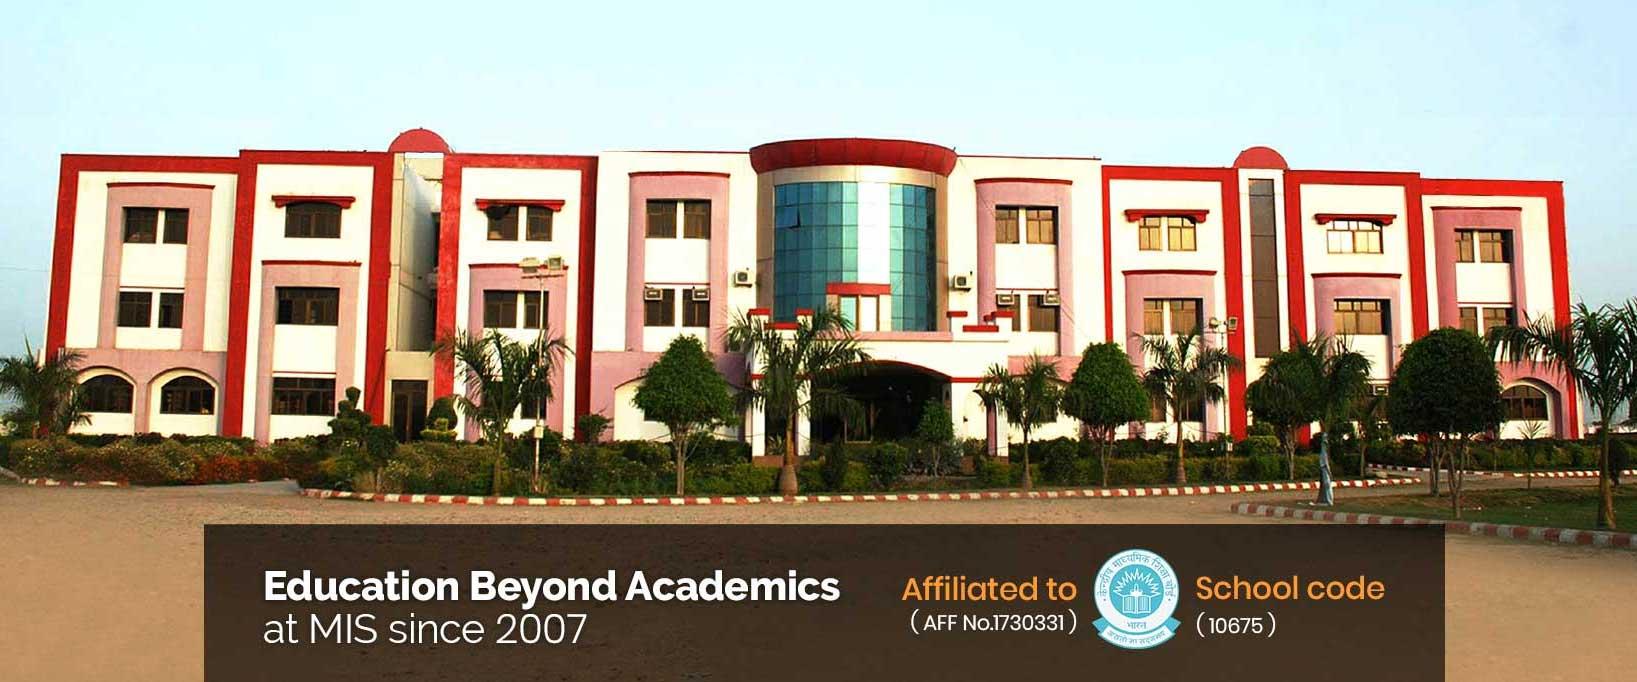 Education Beyond Academics